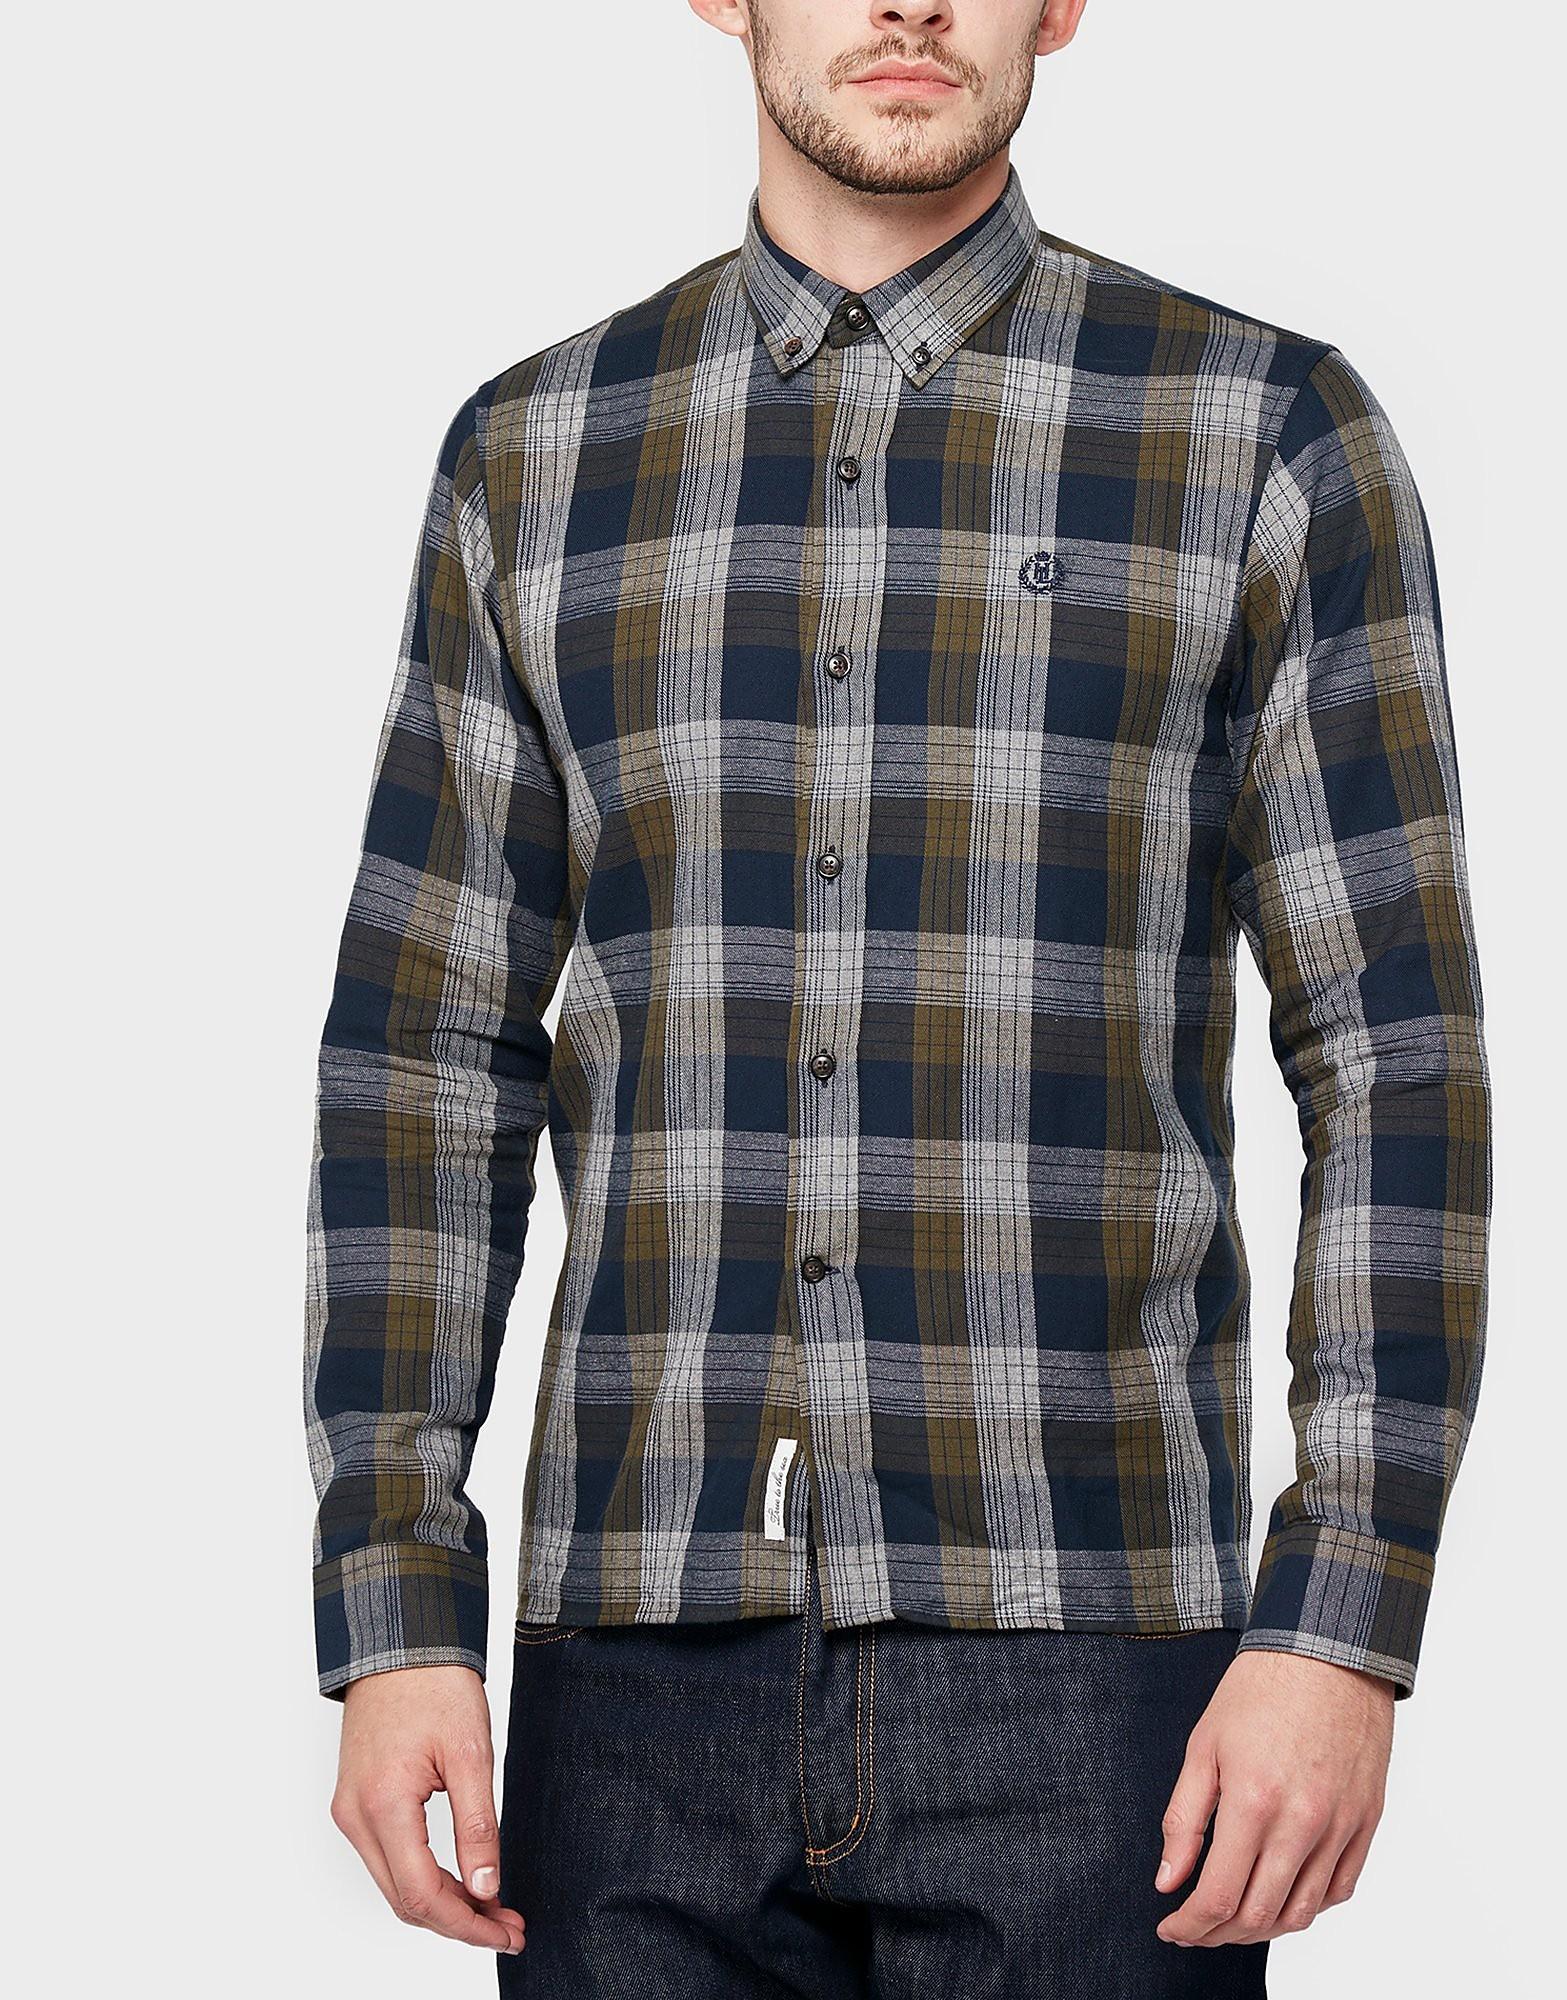 Henri Lloyd Newberry Shirt